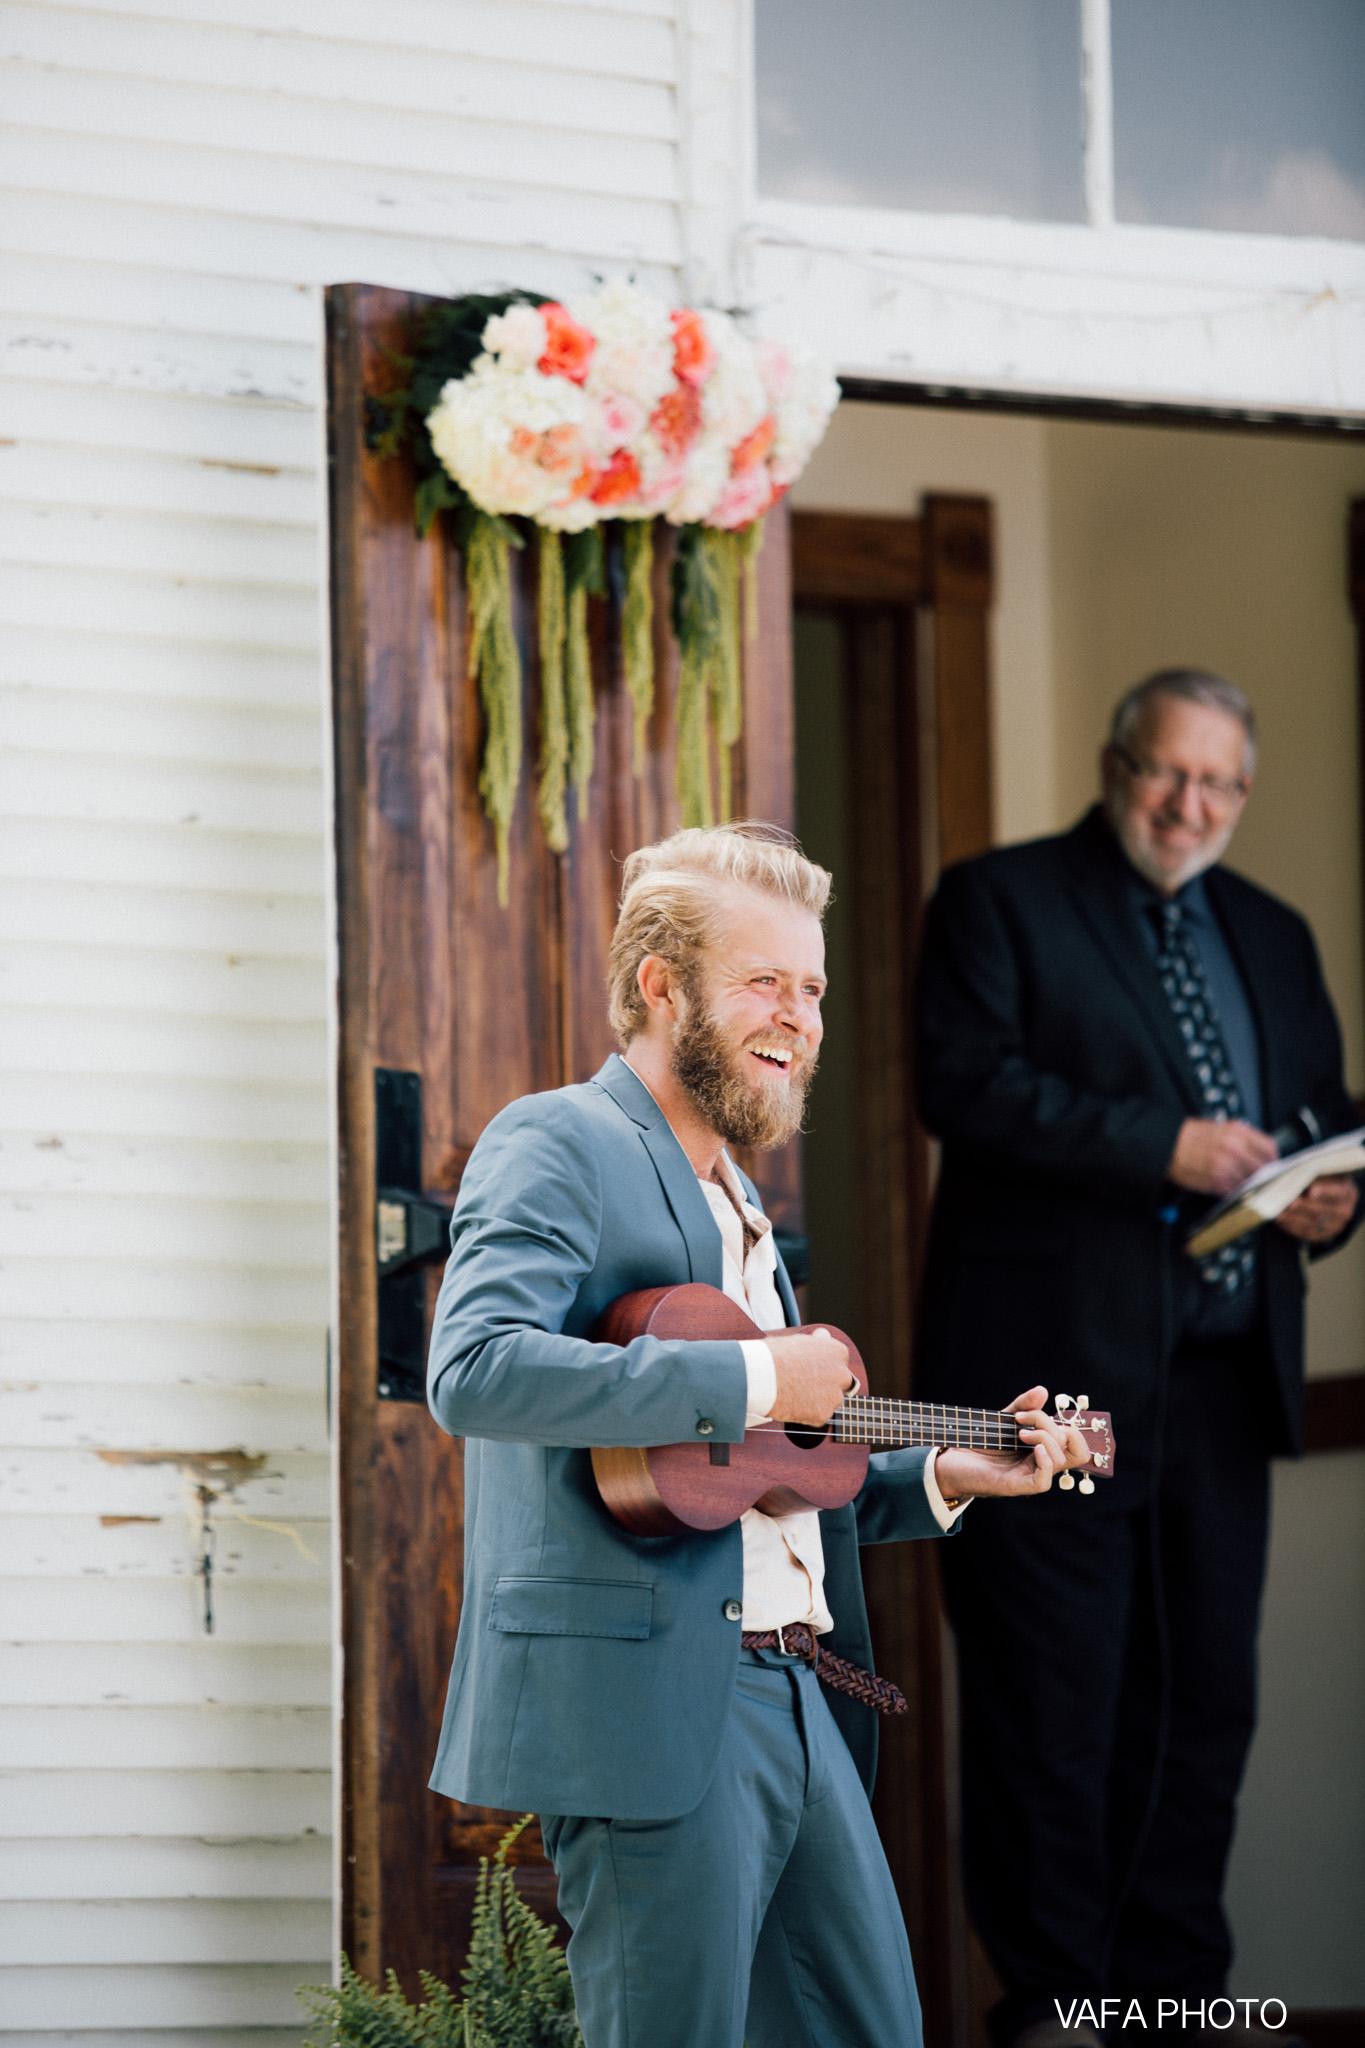 The-Felt-Estate-Wedding-Kailie-David-Vafa-Photo-280.jpg